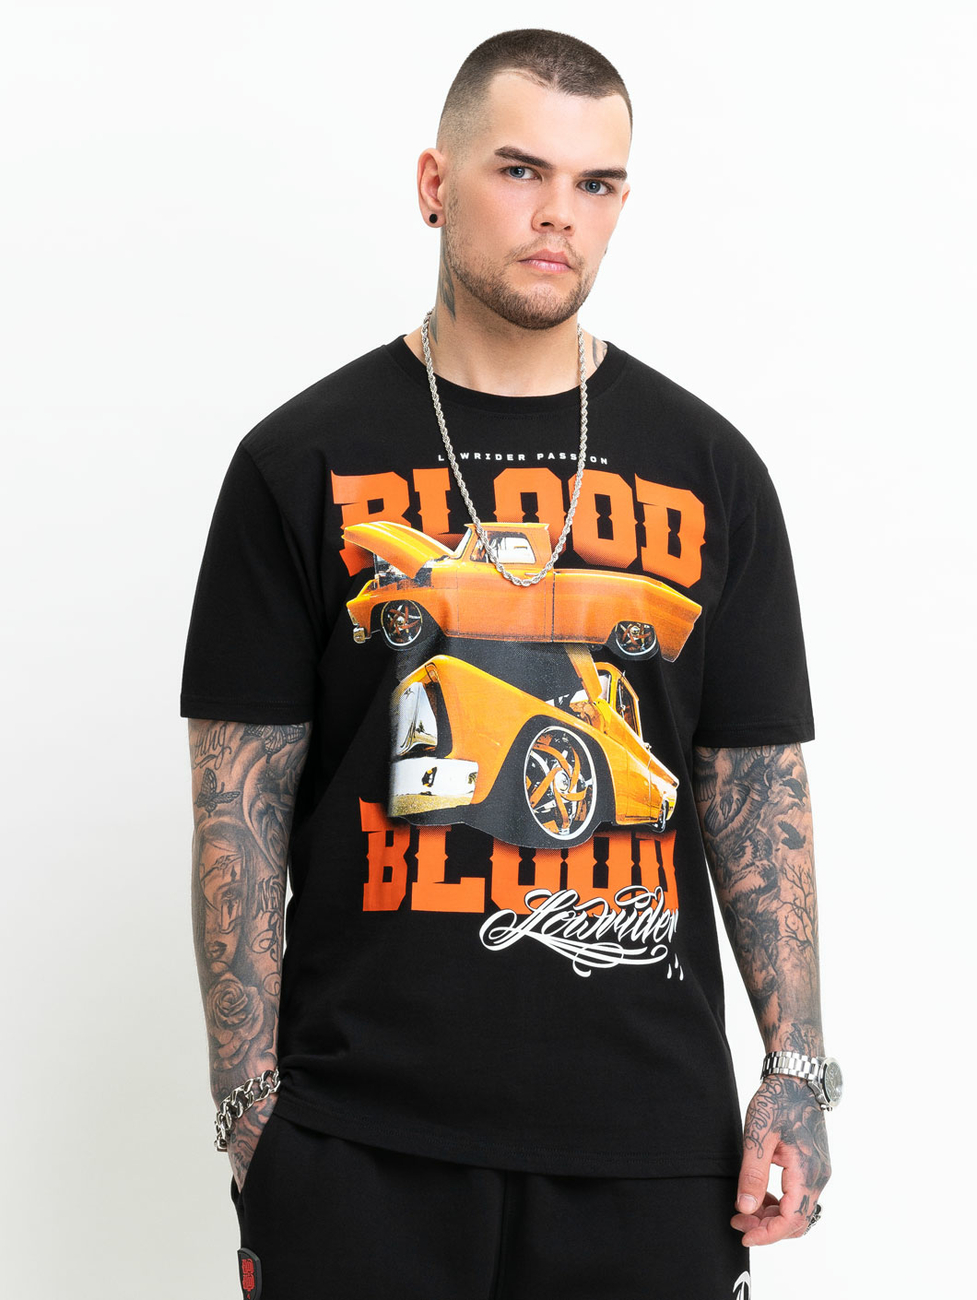 Blood In Blood Out Nizado T-Shirt XL